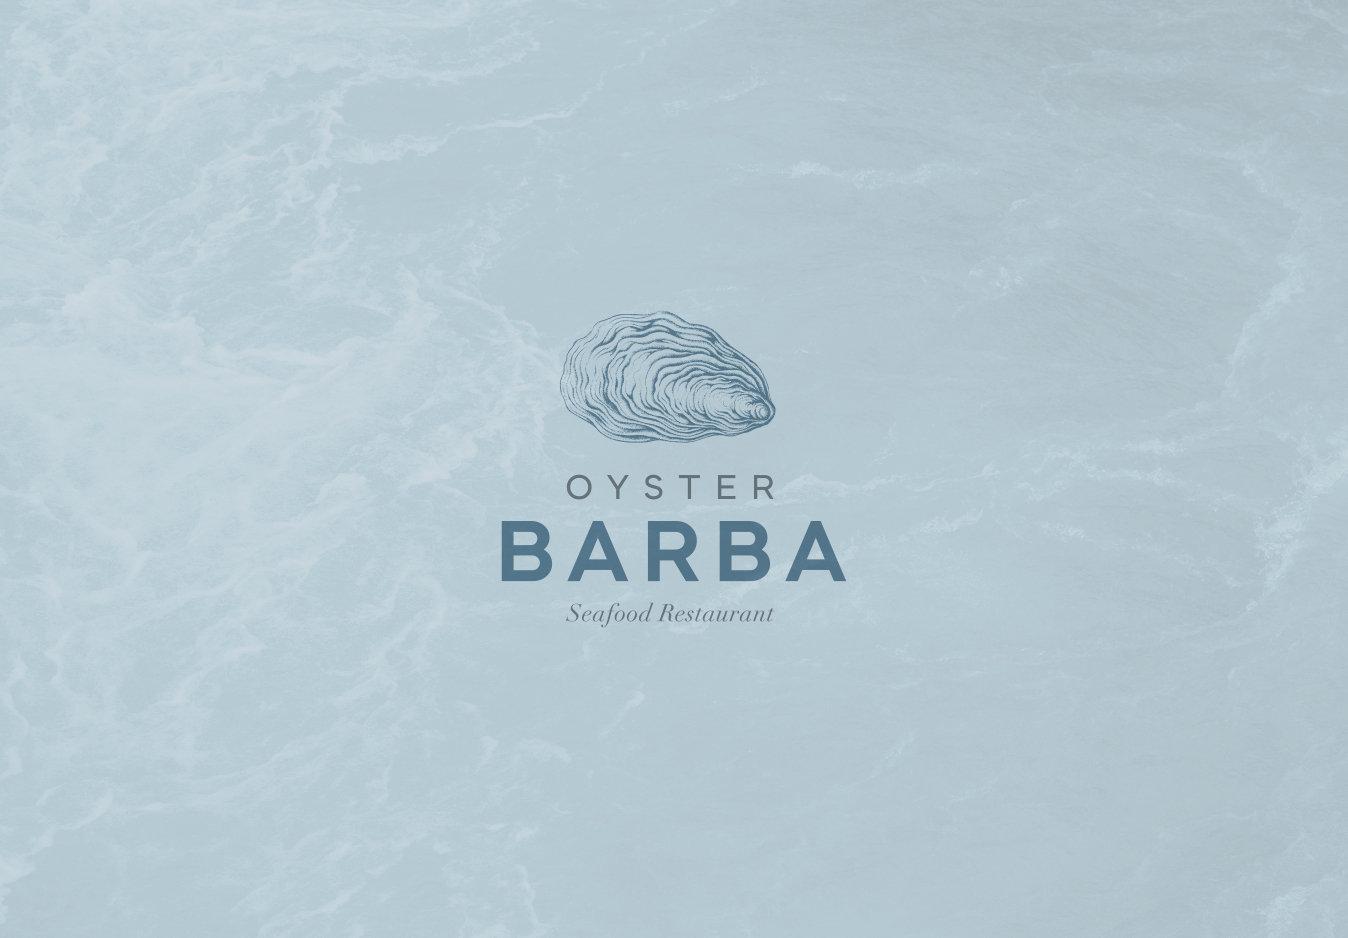 oyster_barba_1